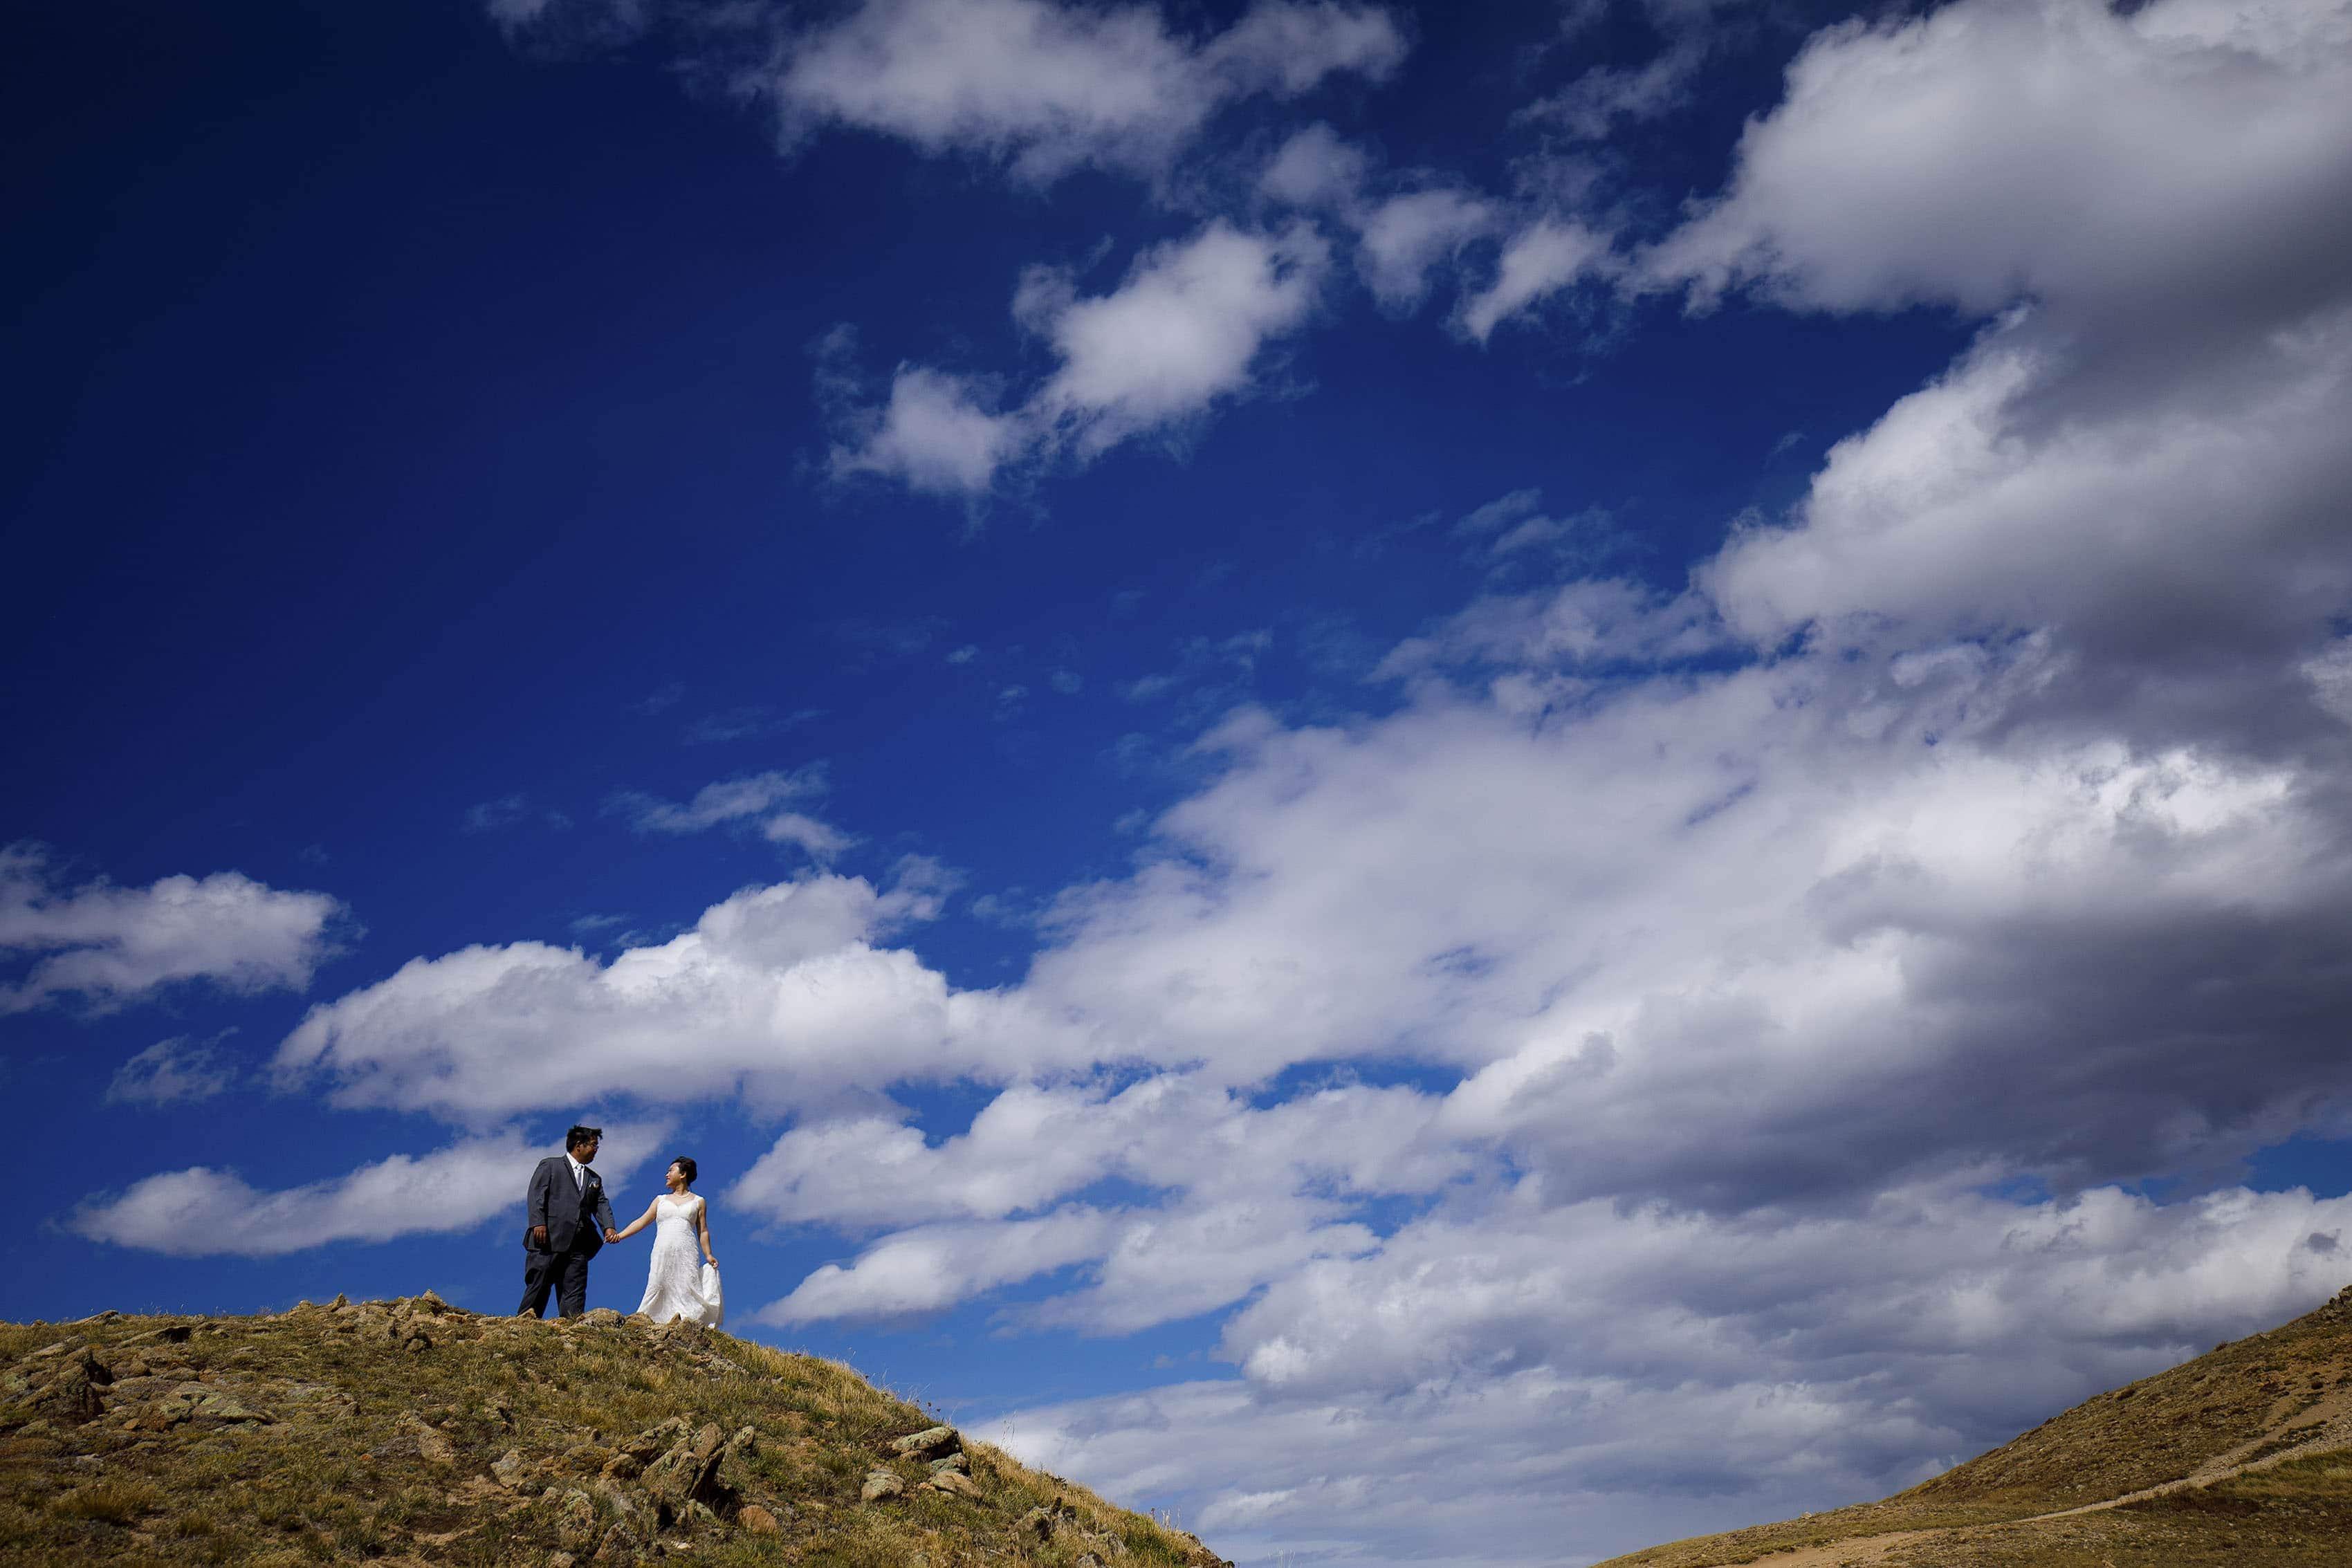 The newlyweds walk together on Loveland Pass